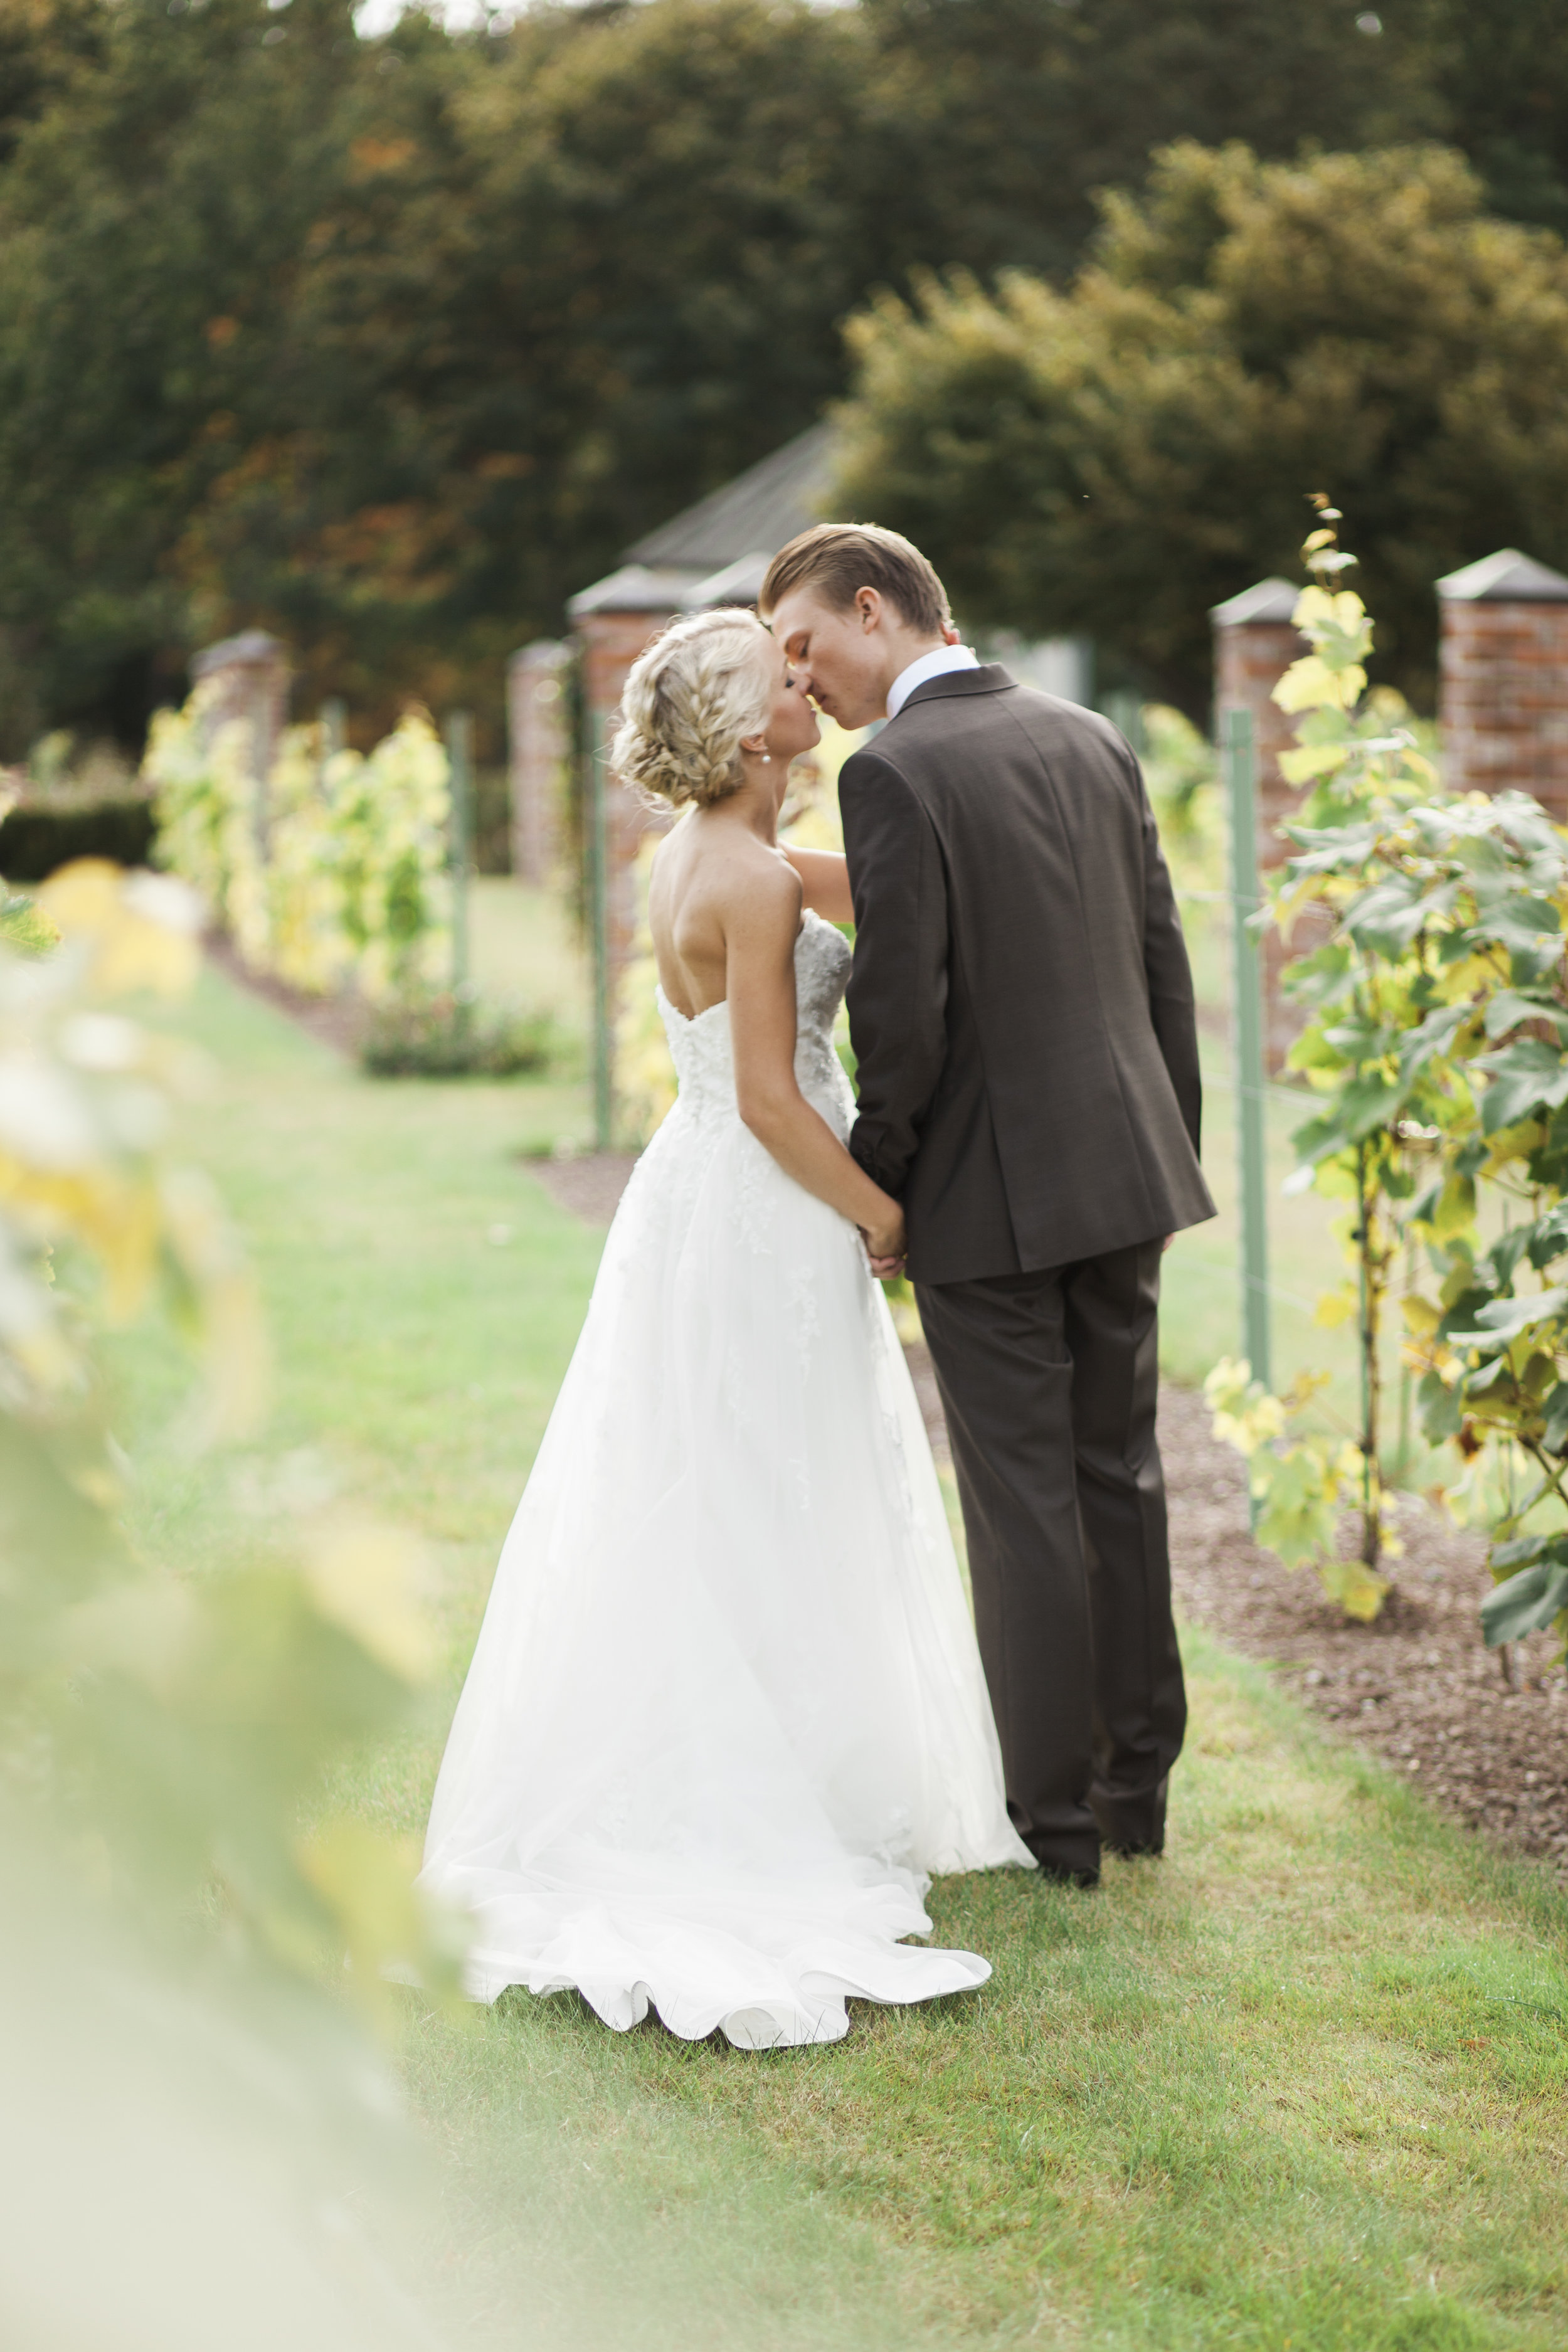 Bröllop-035.jpg